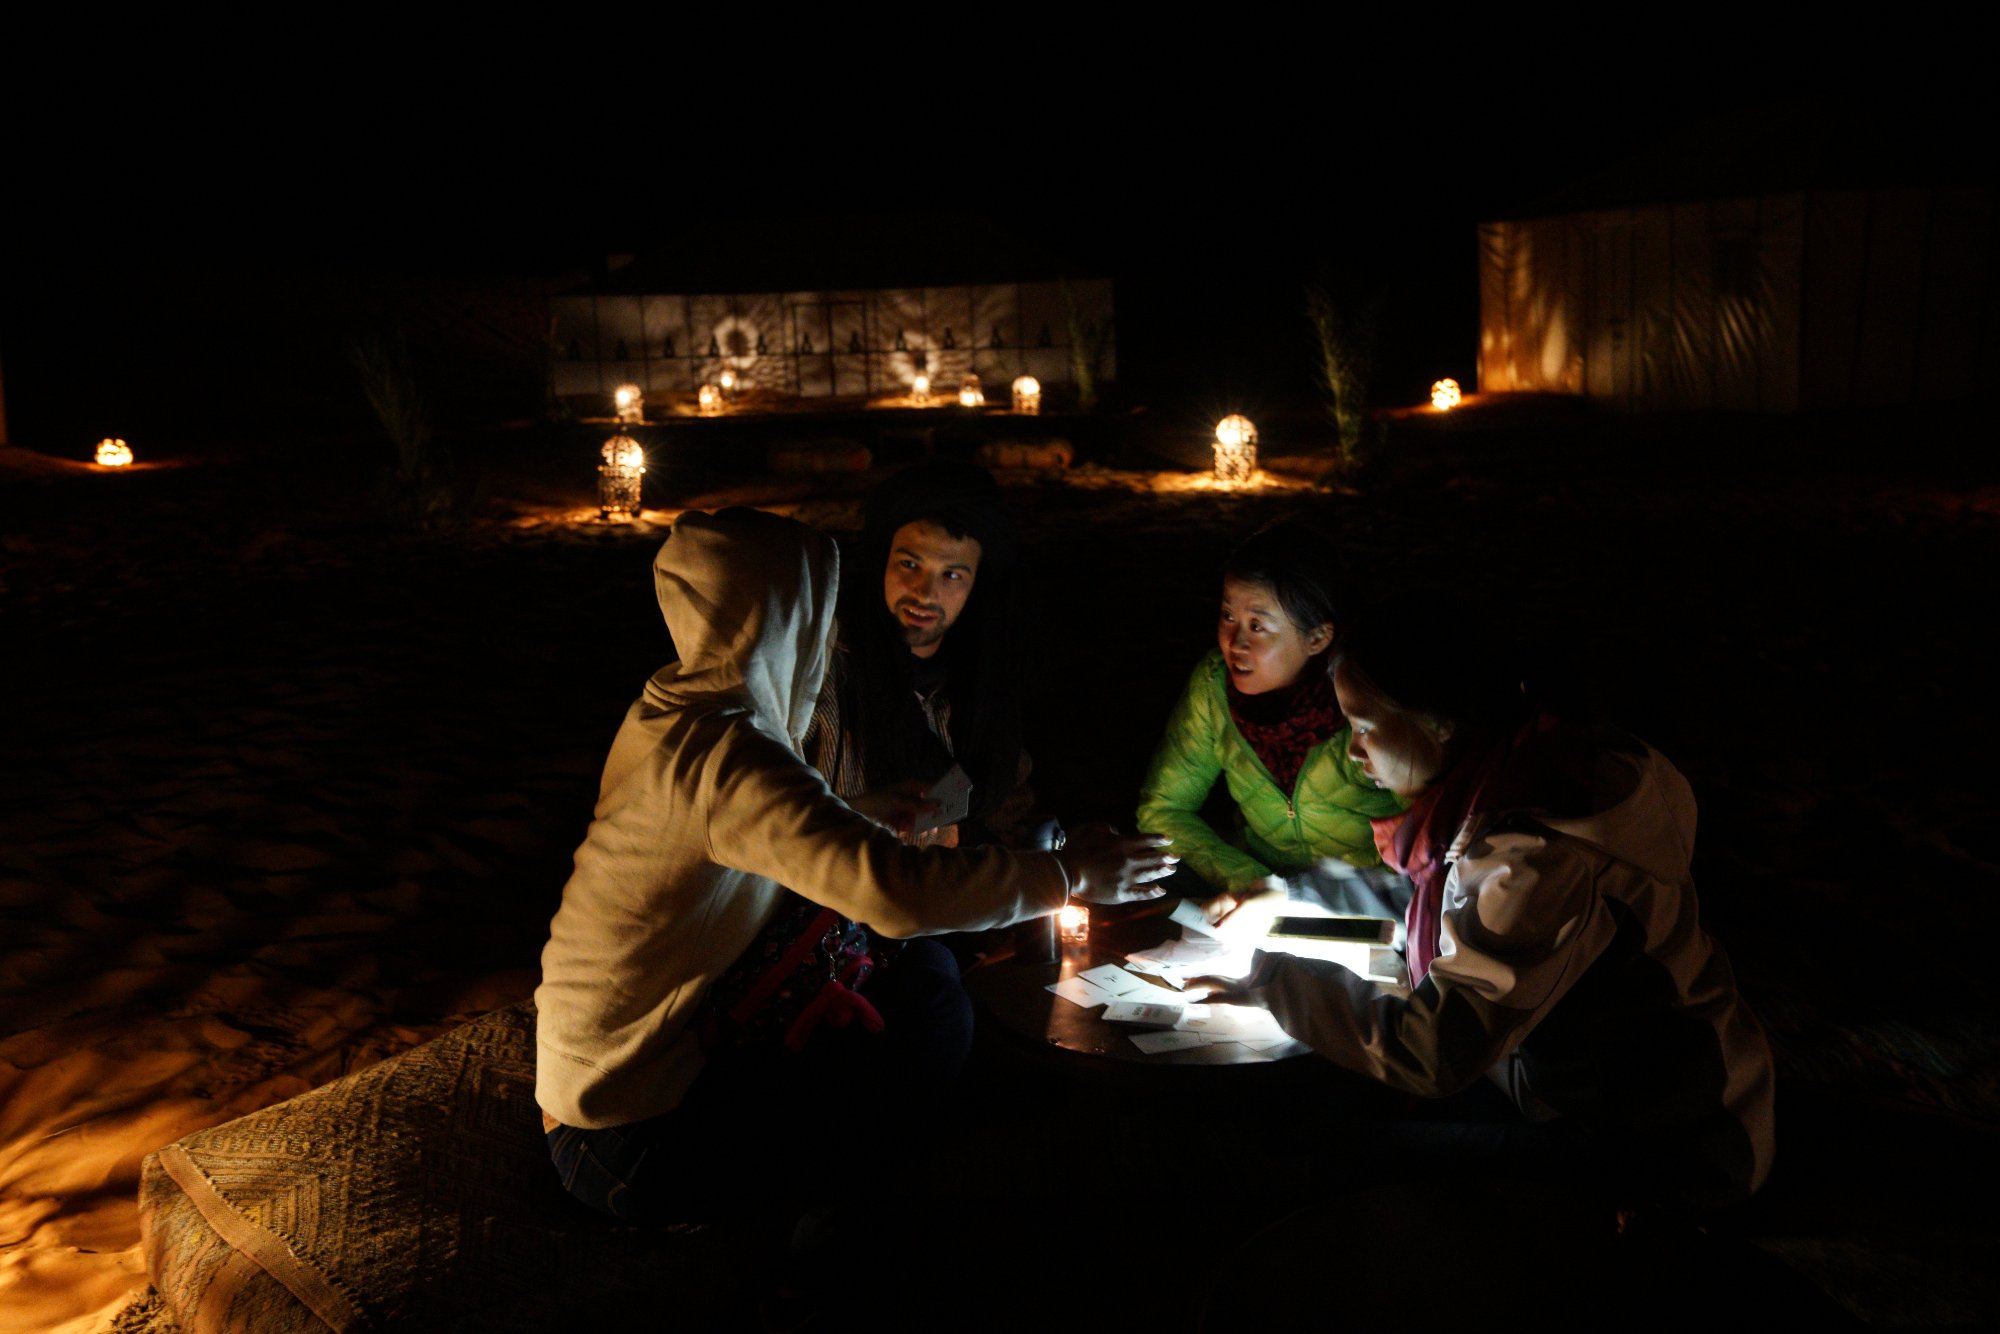 Awesome Caravanserai Luxury Desert Camp Jaima Lujo  Tienda Superior Desierto